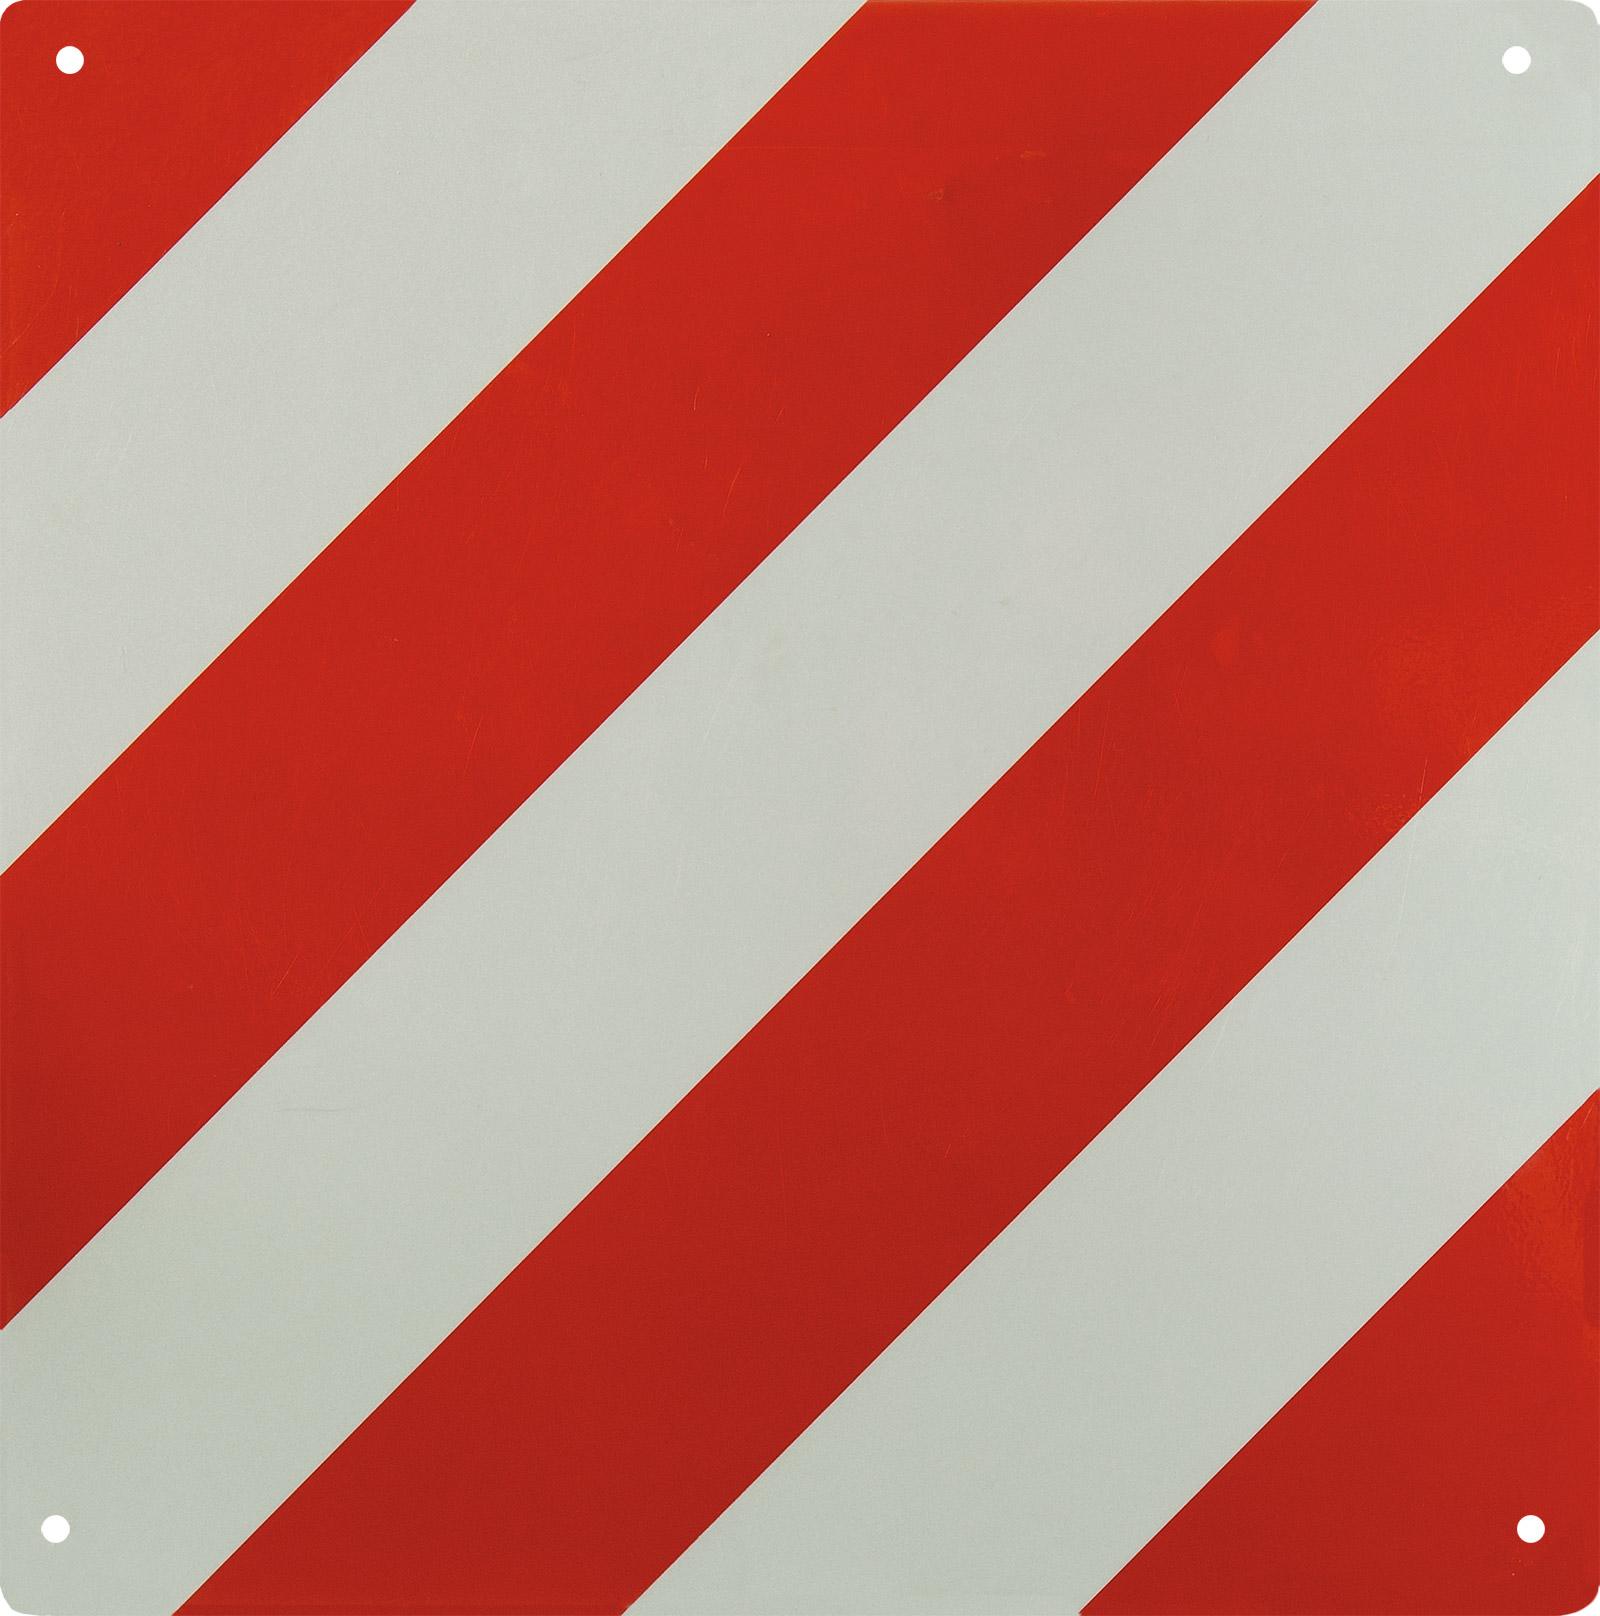 warntafel reflektor schild rot wei alu 50x50 cm neu 69067